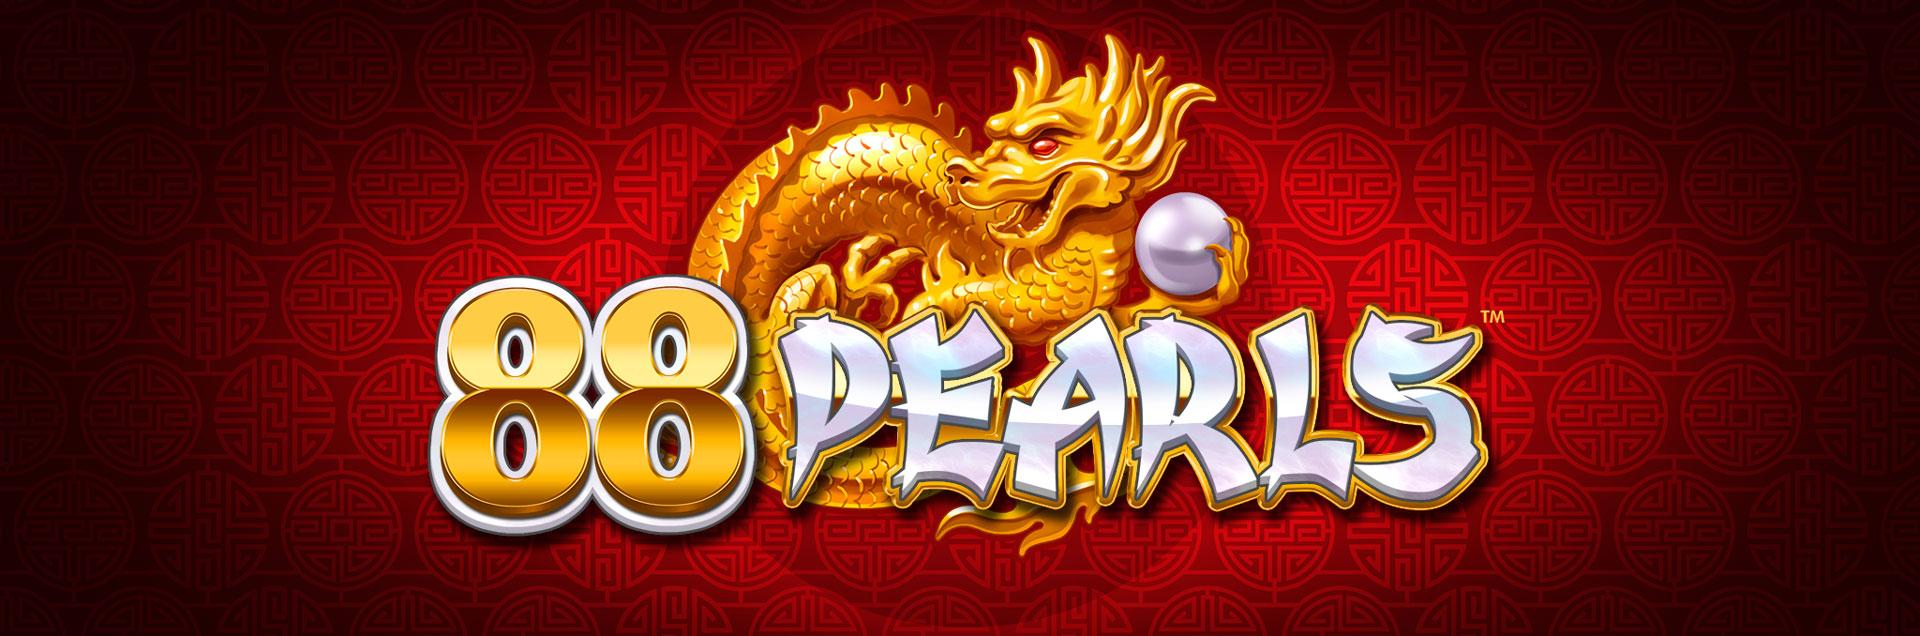 88Pearls logo2